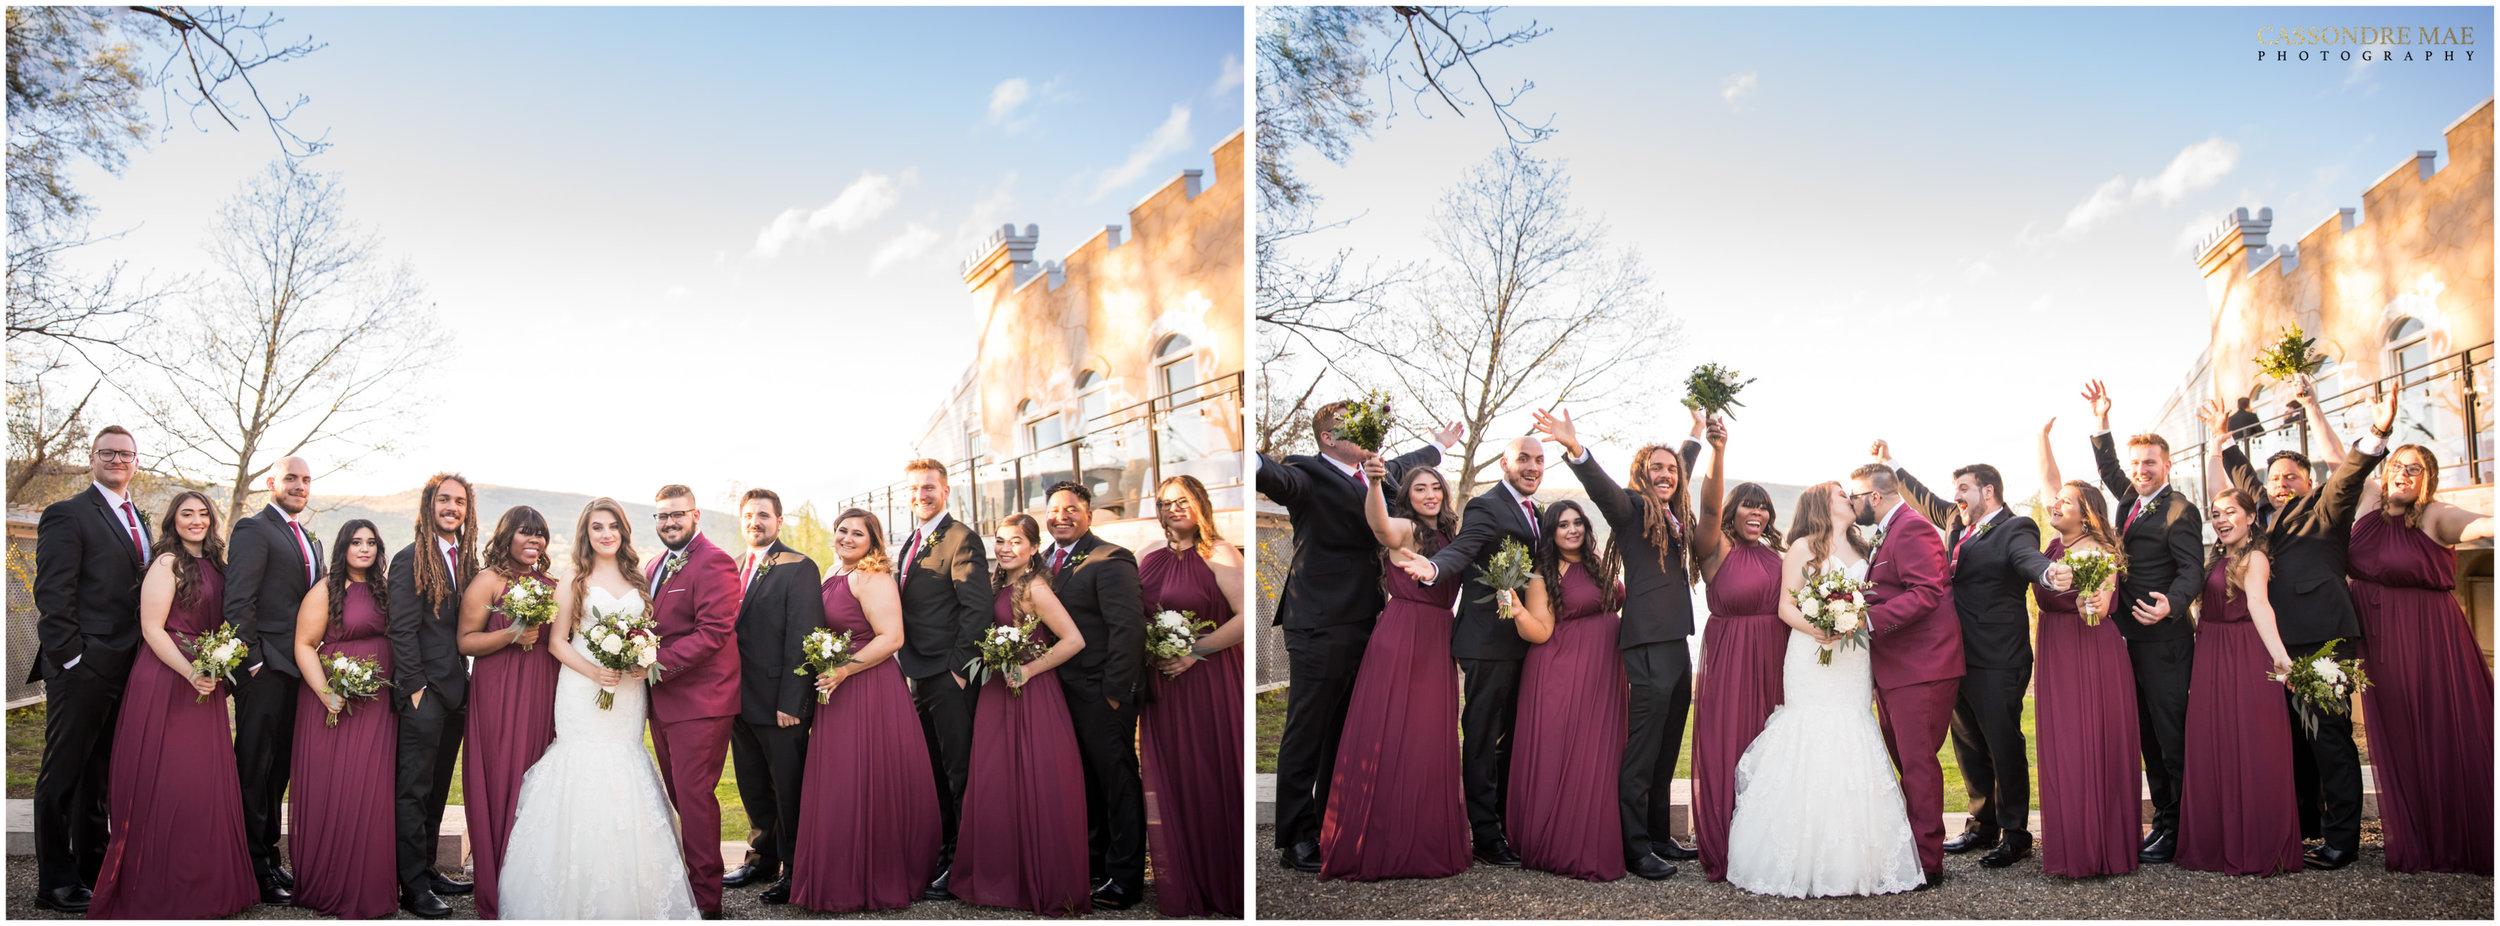 Cassondre Mae Photography Cove Castle Weddings 26.jpg